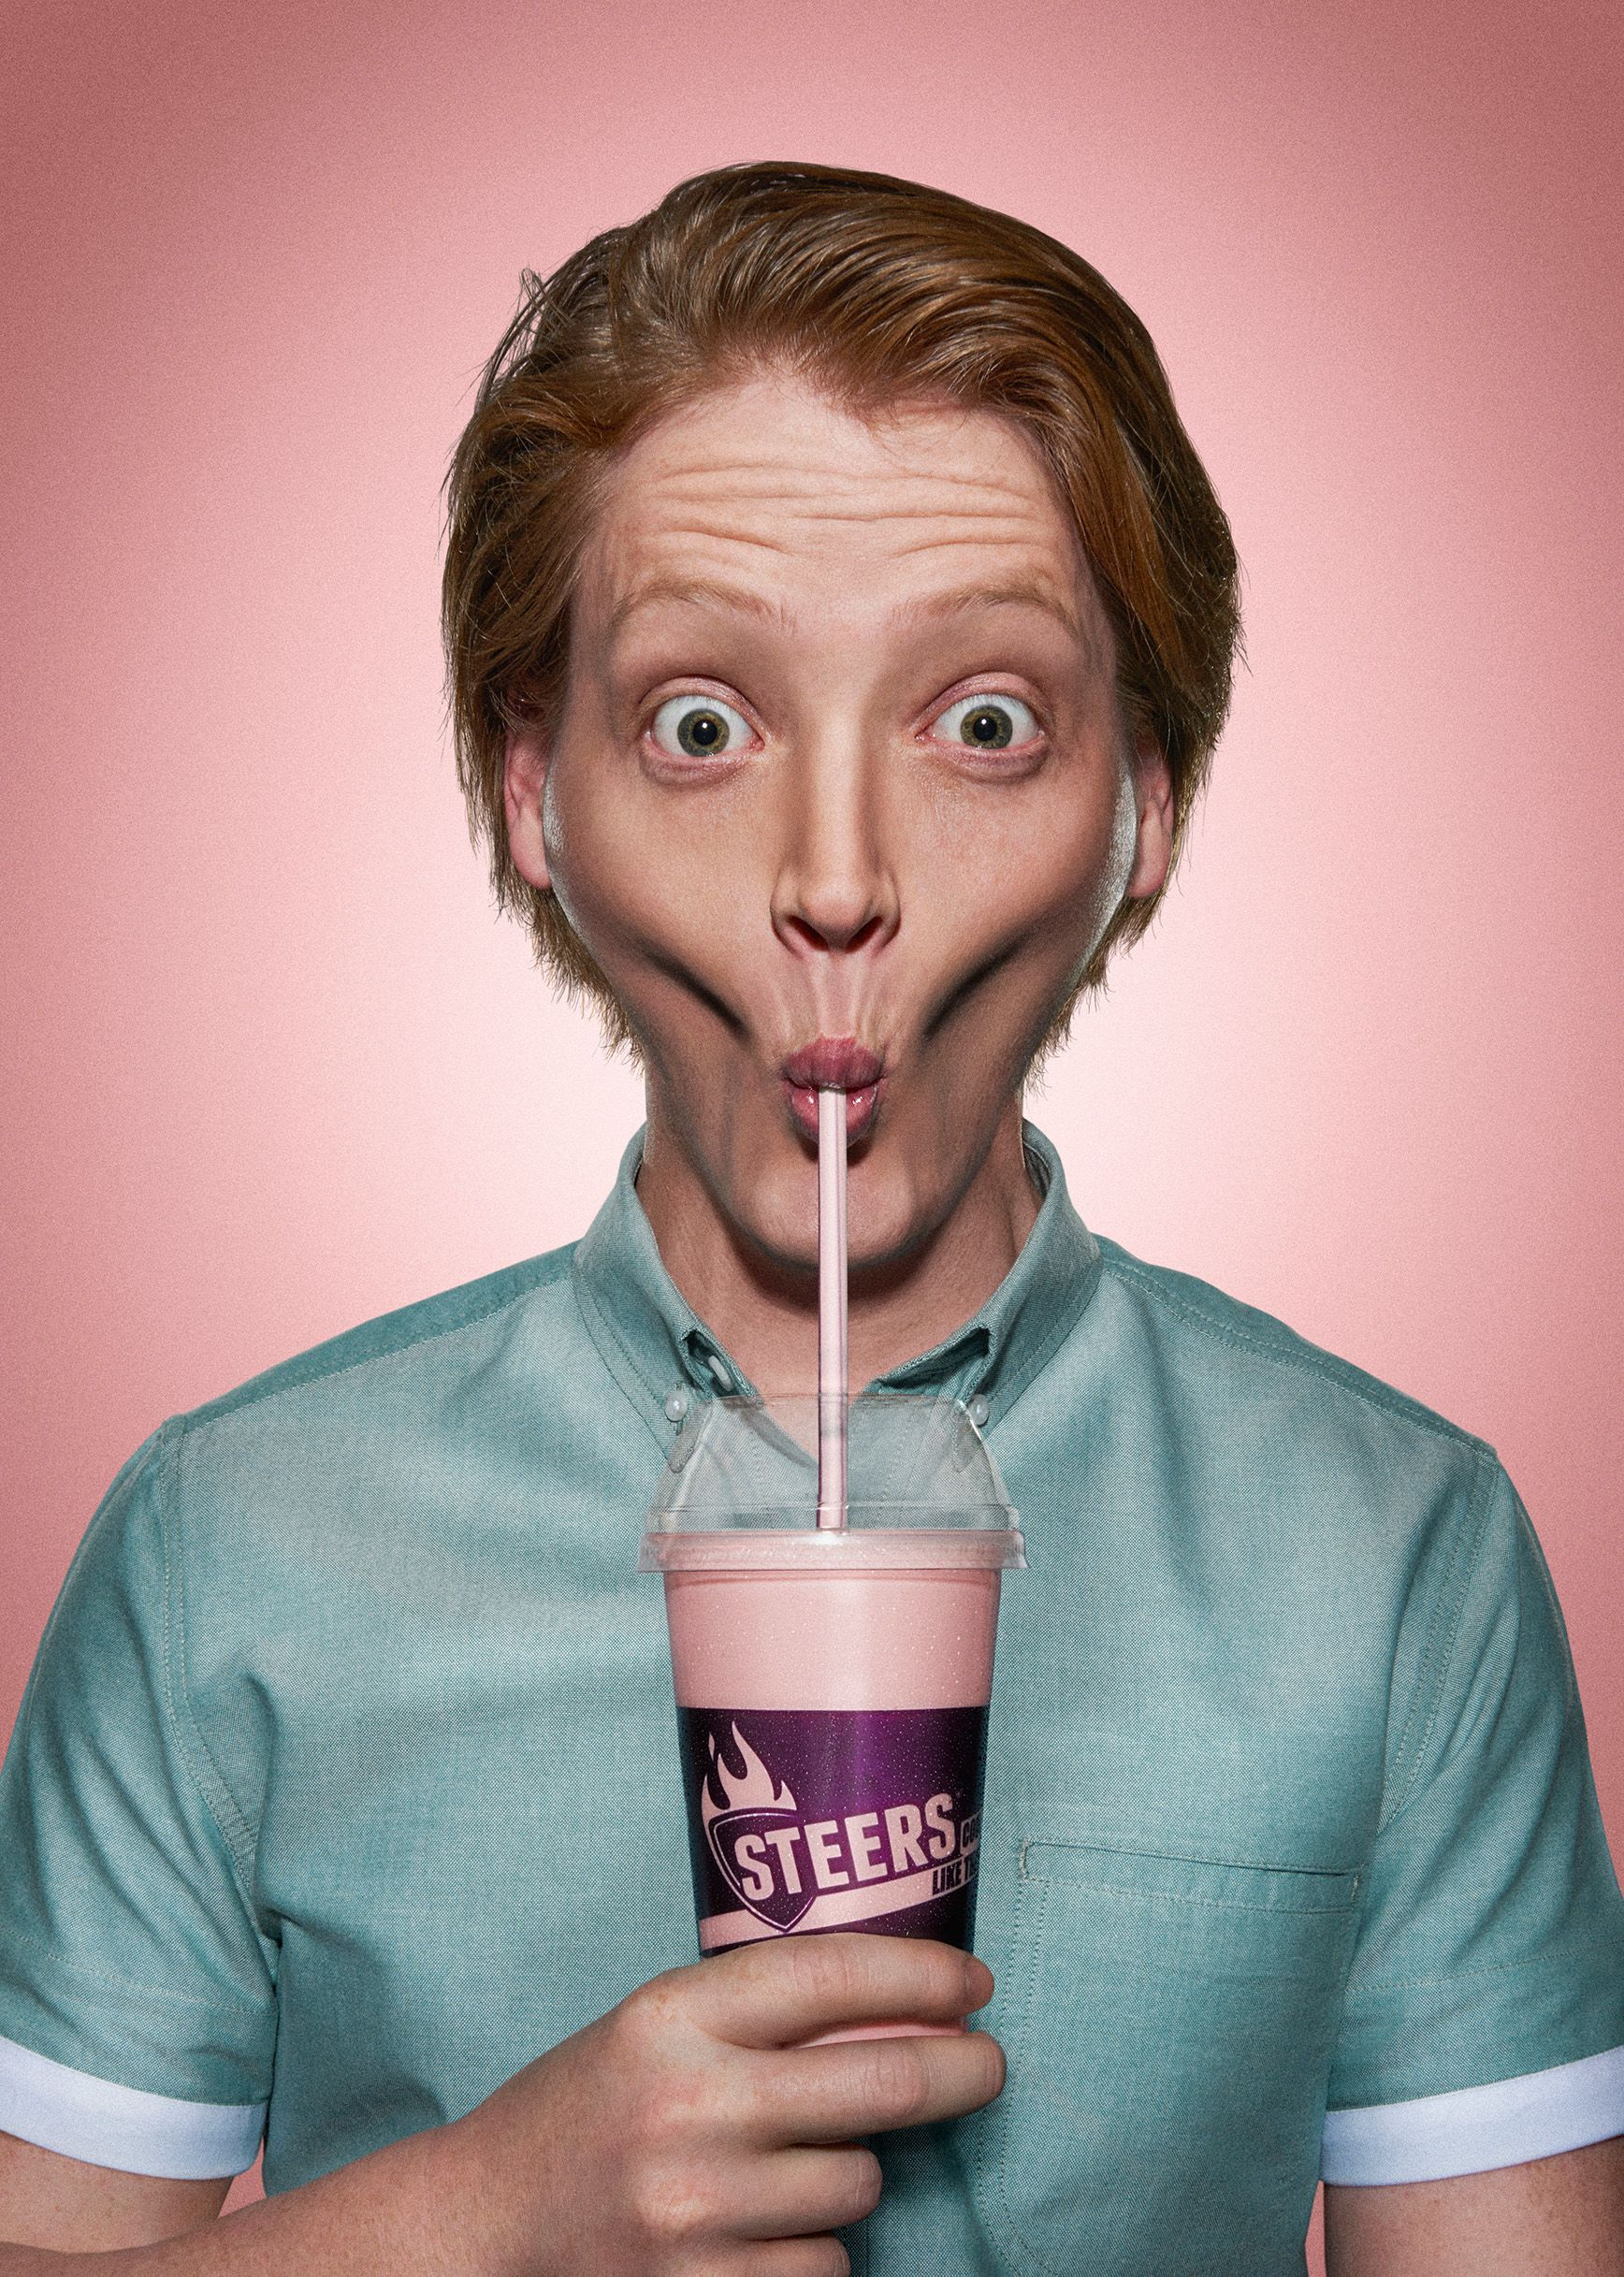 Echa un vistazo a este proyecto @Behance: \u201cSteers - Ridiculously Thick Milkshakes\u201d https://www.behance.net/gallery/33126705/Steers-Ridiculously-Thick-Milkshakes